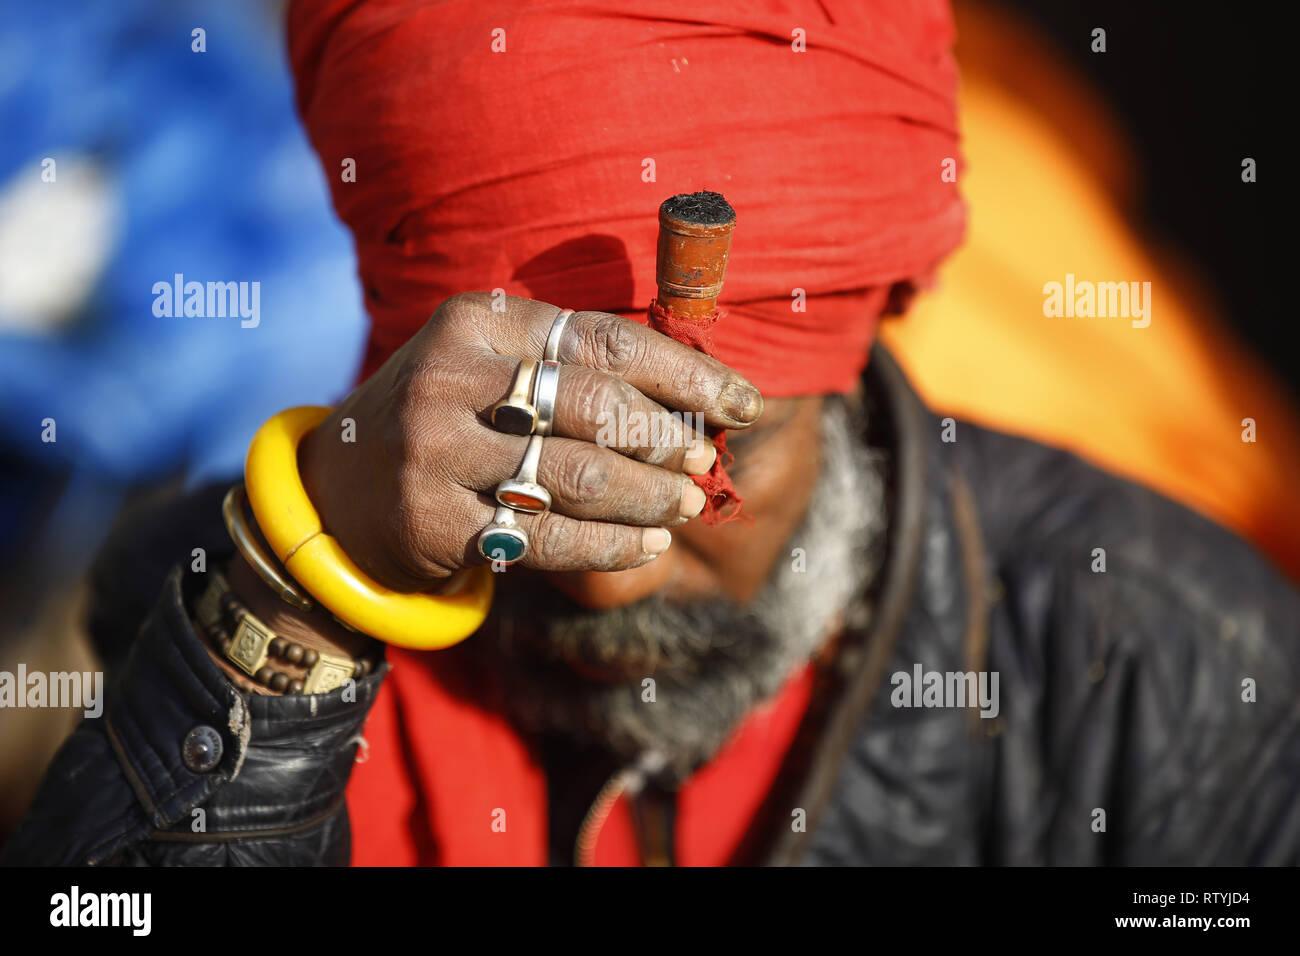 Kathmandu Nepal 3rd Mar 2019 A Sadhu Or Holy Man Followers Of Lord Shiva Prepares To